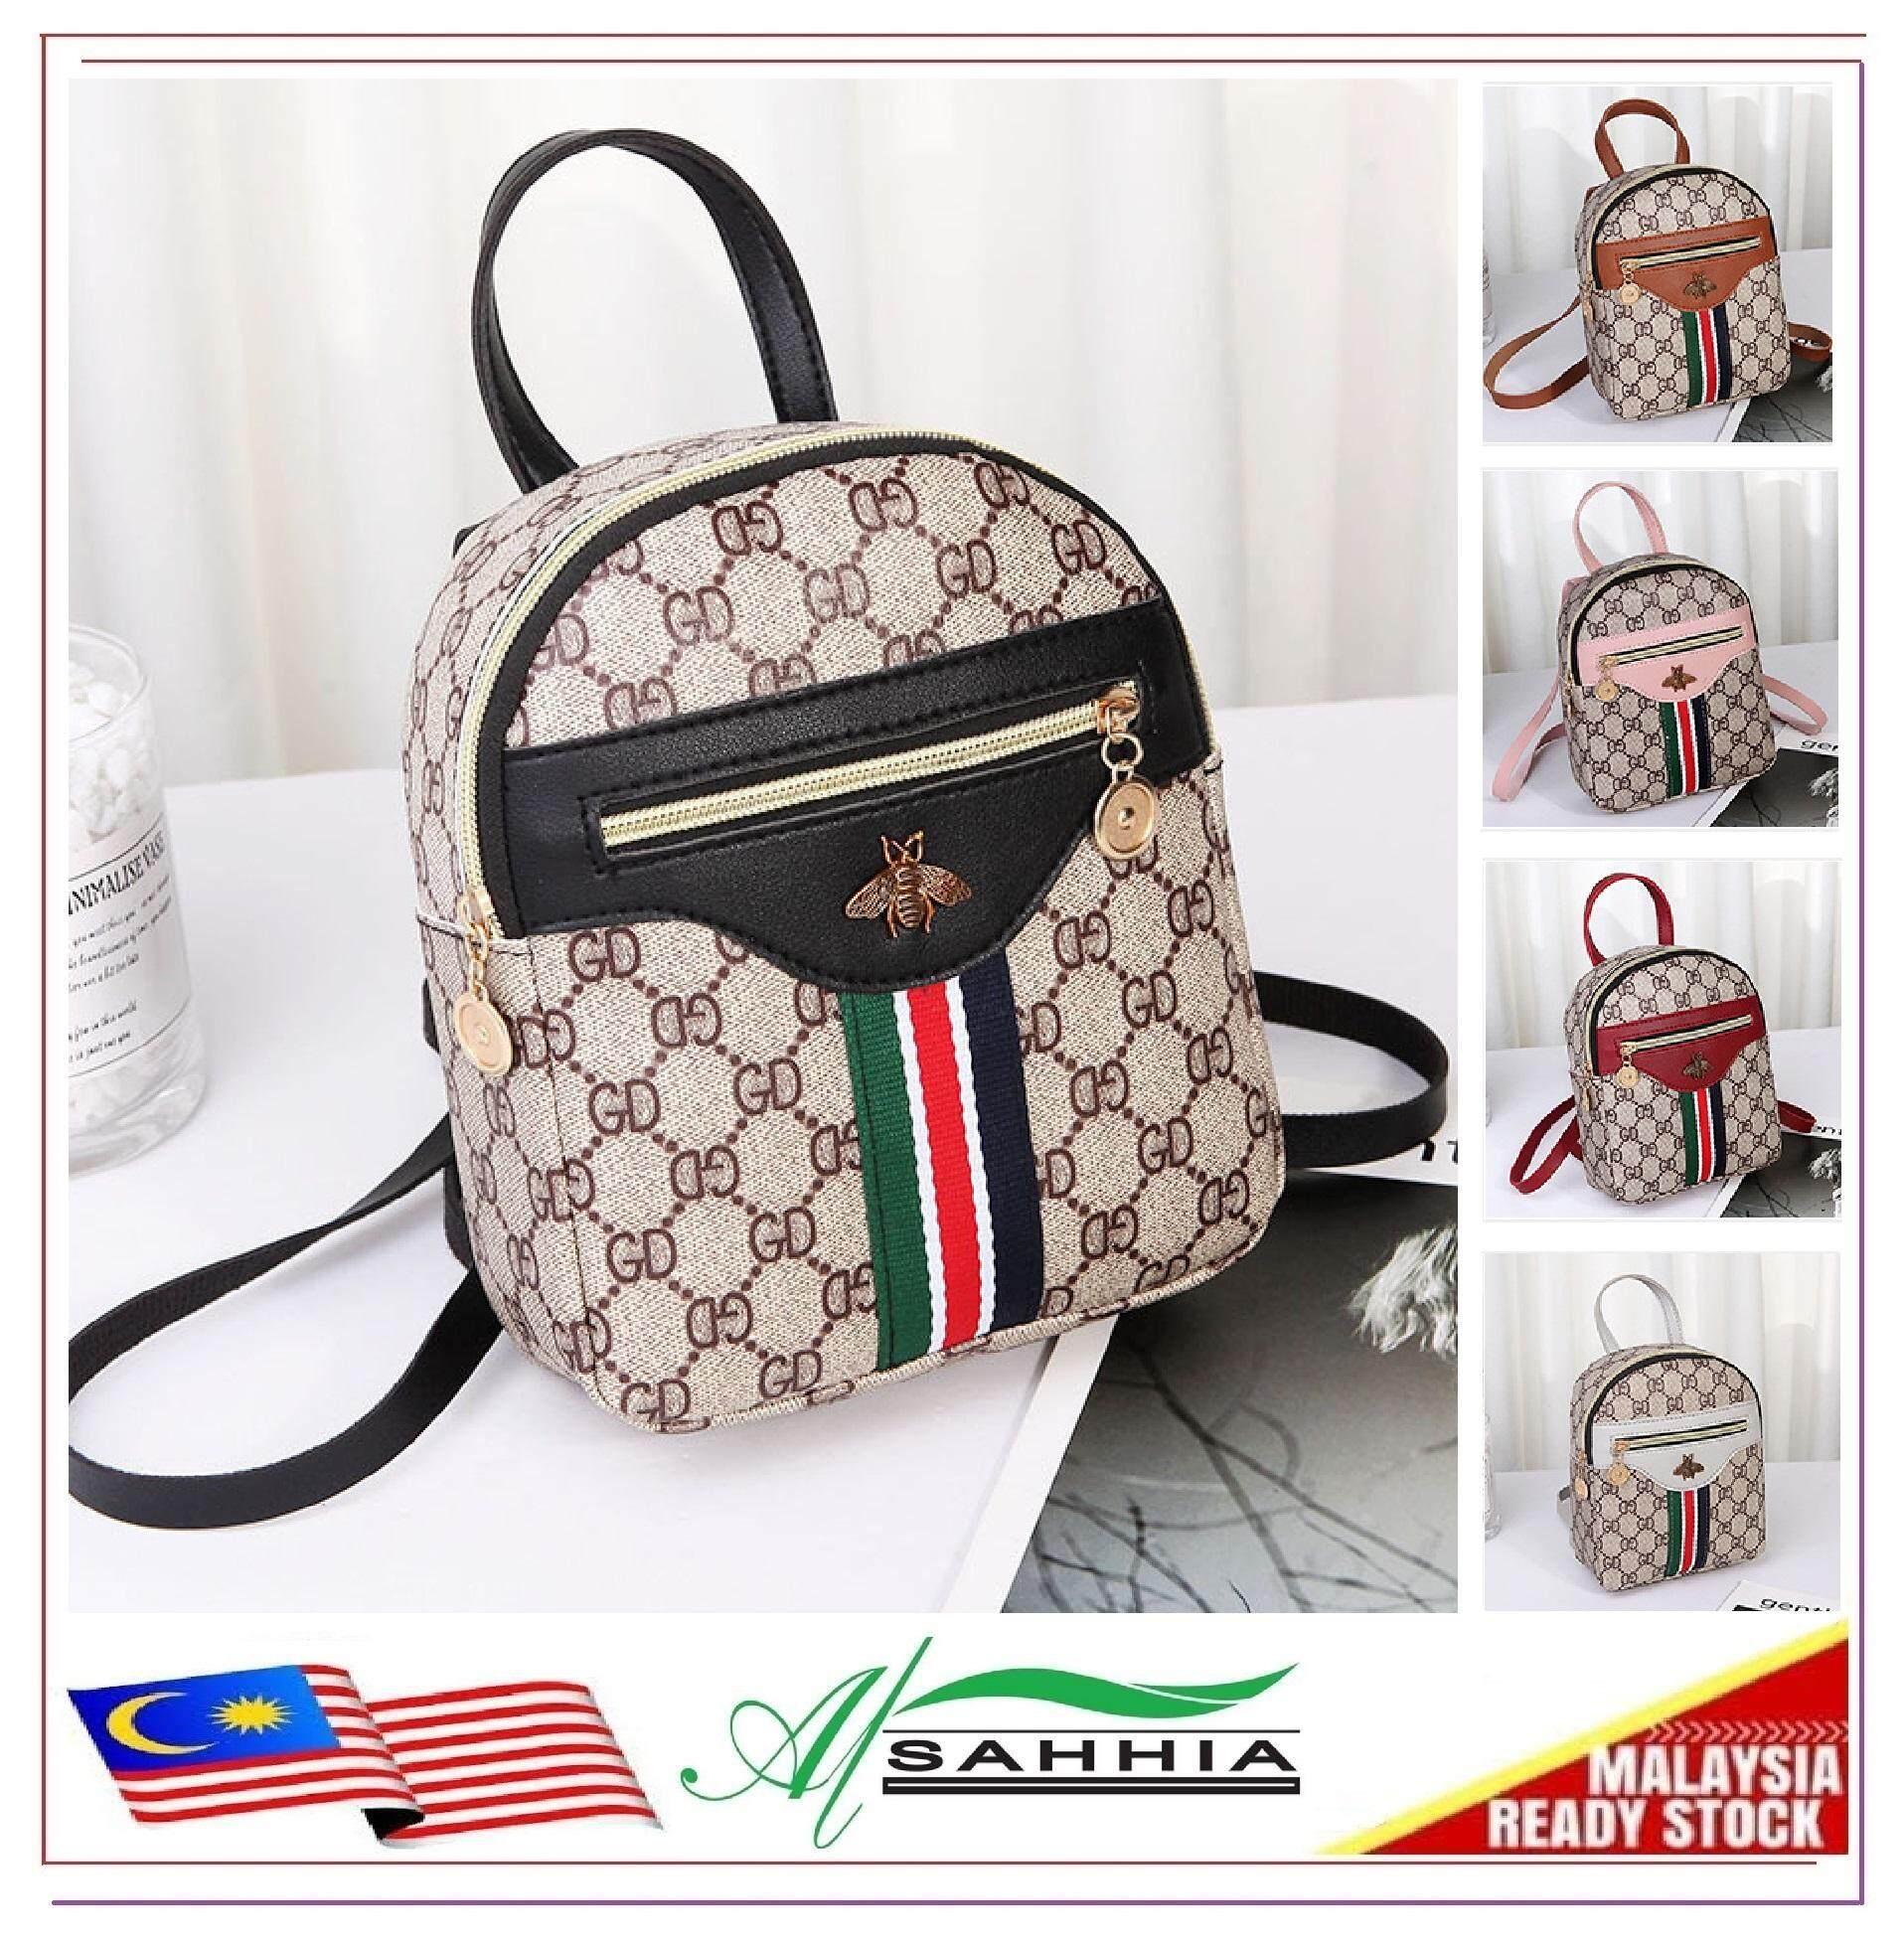 07d179a5377 9P4 Al Sahhia Ready Stock Miniom GD Backpack Sling Shoulder Bag